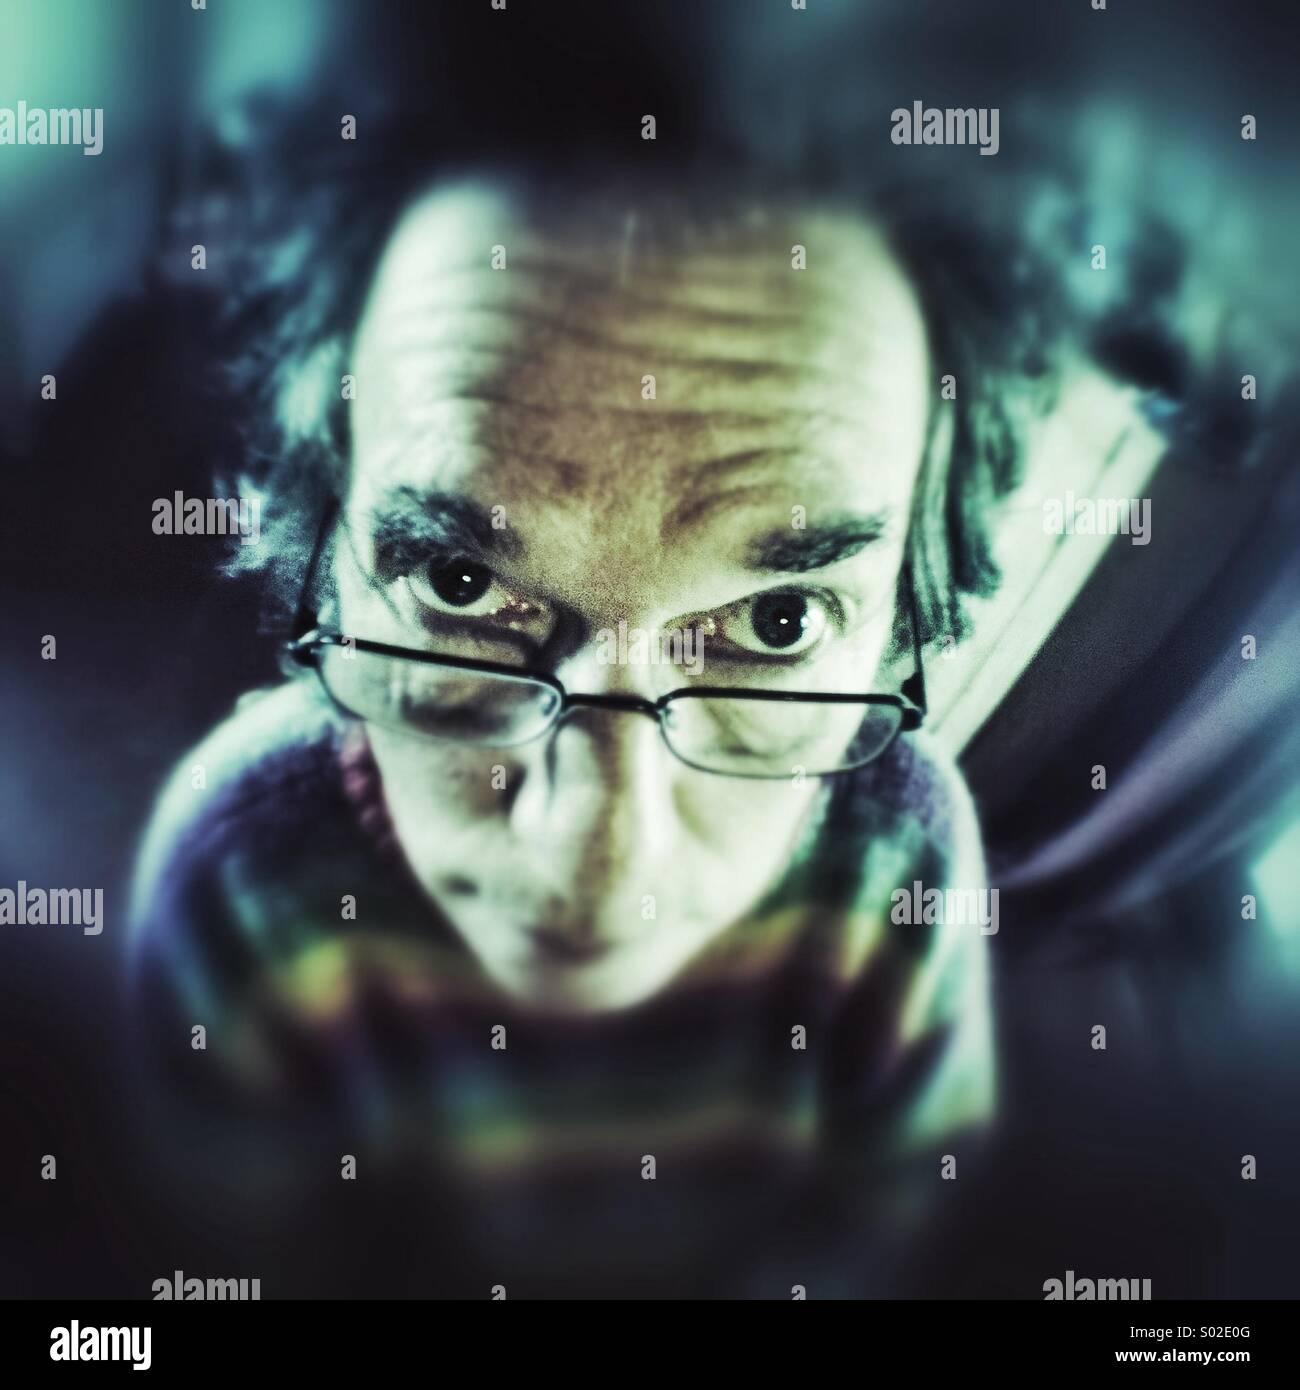 Geeky dude - Stock Image